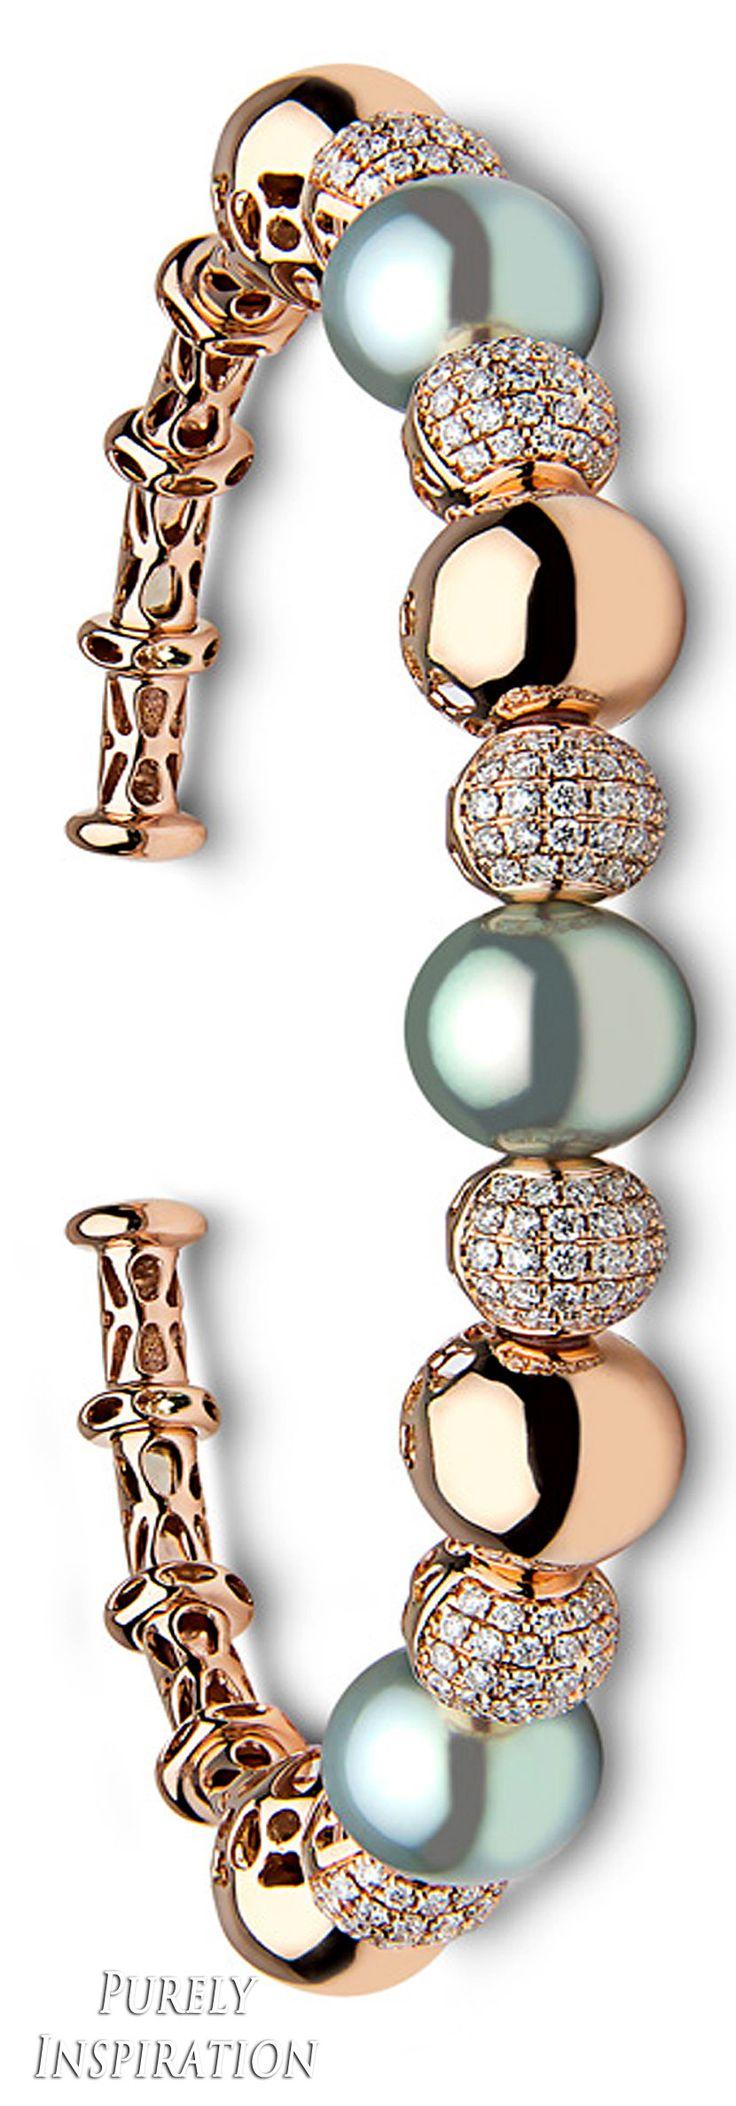 Yoko London Blue Rose Bracelet 18k rose gold, diamonds, golden Tahitian pearls   Purely Inspiratio                                                                                                                                                                                 More